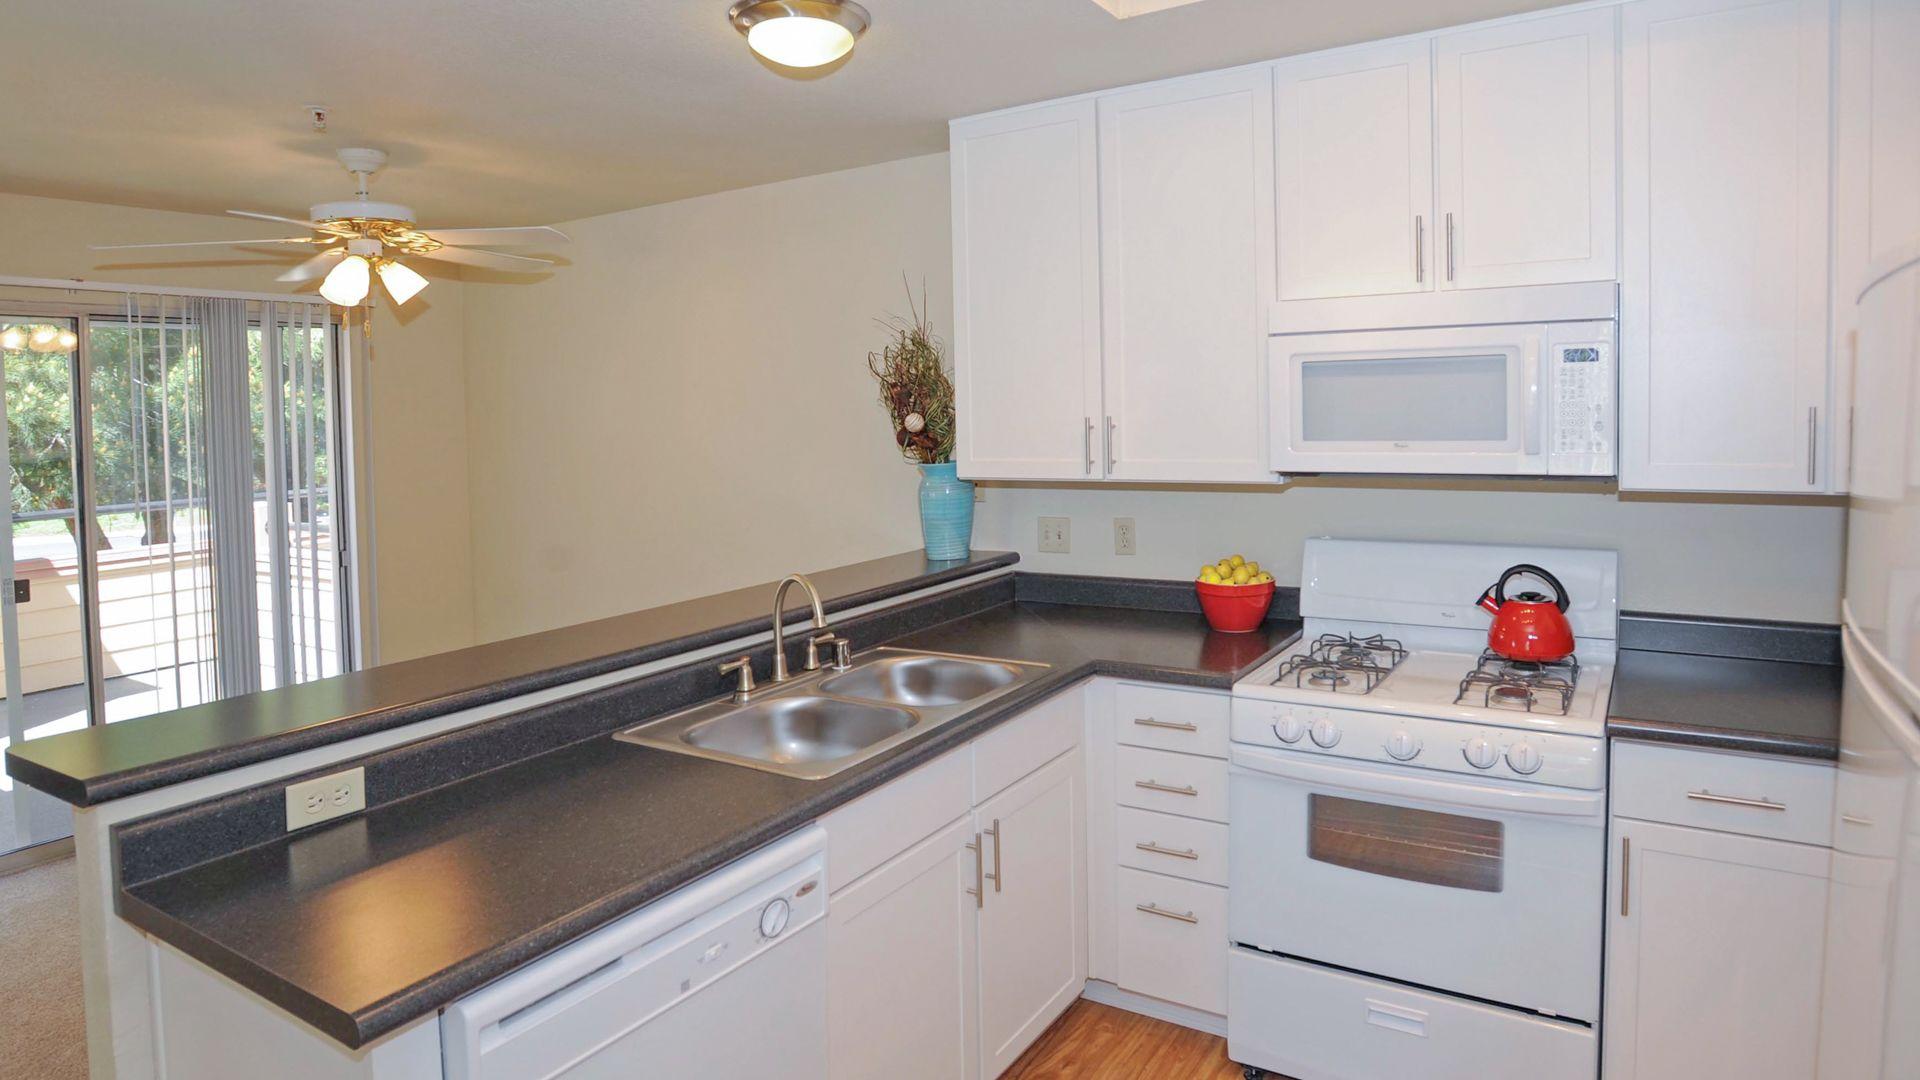 Schooner Bay Apartment Homes - Kitchen